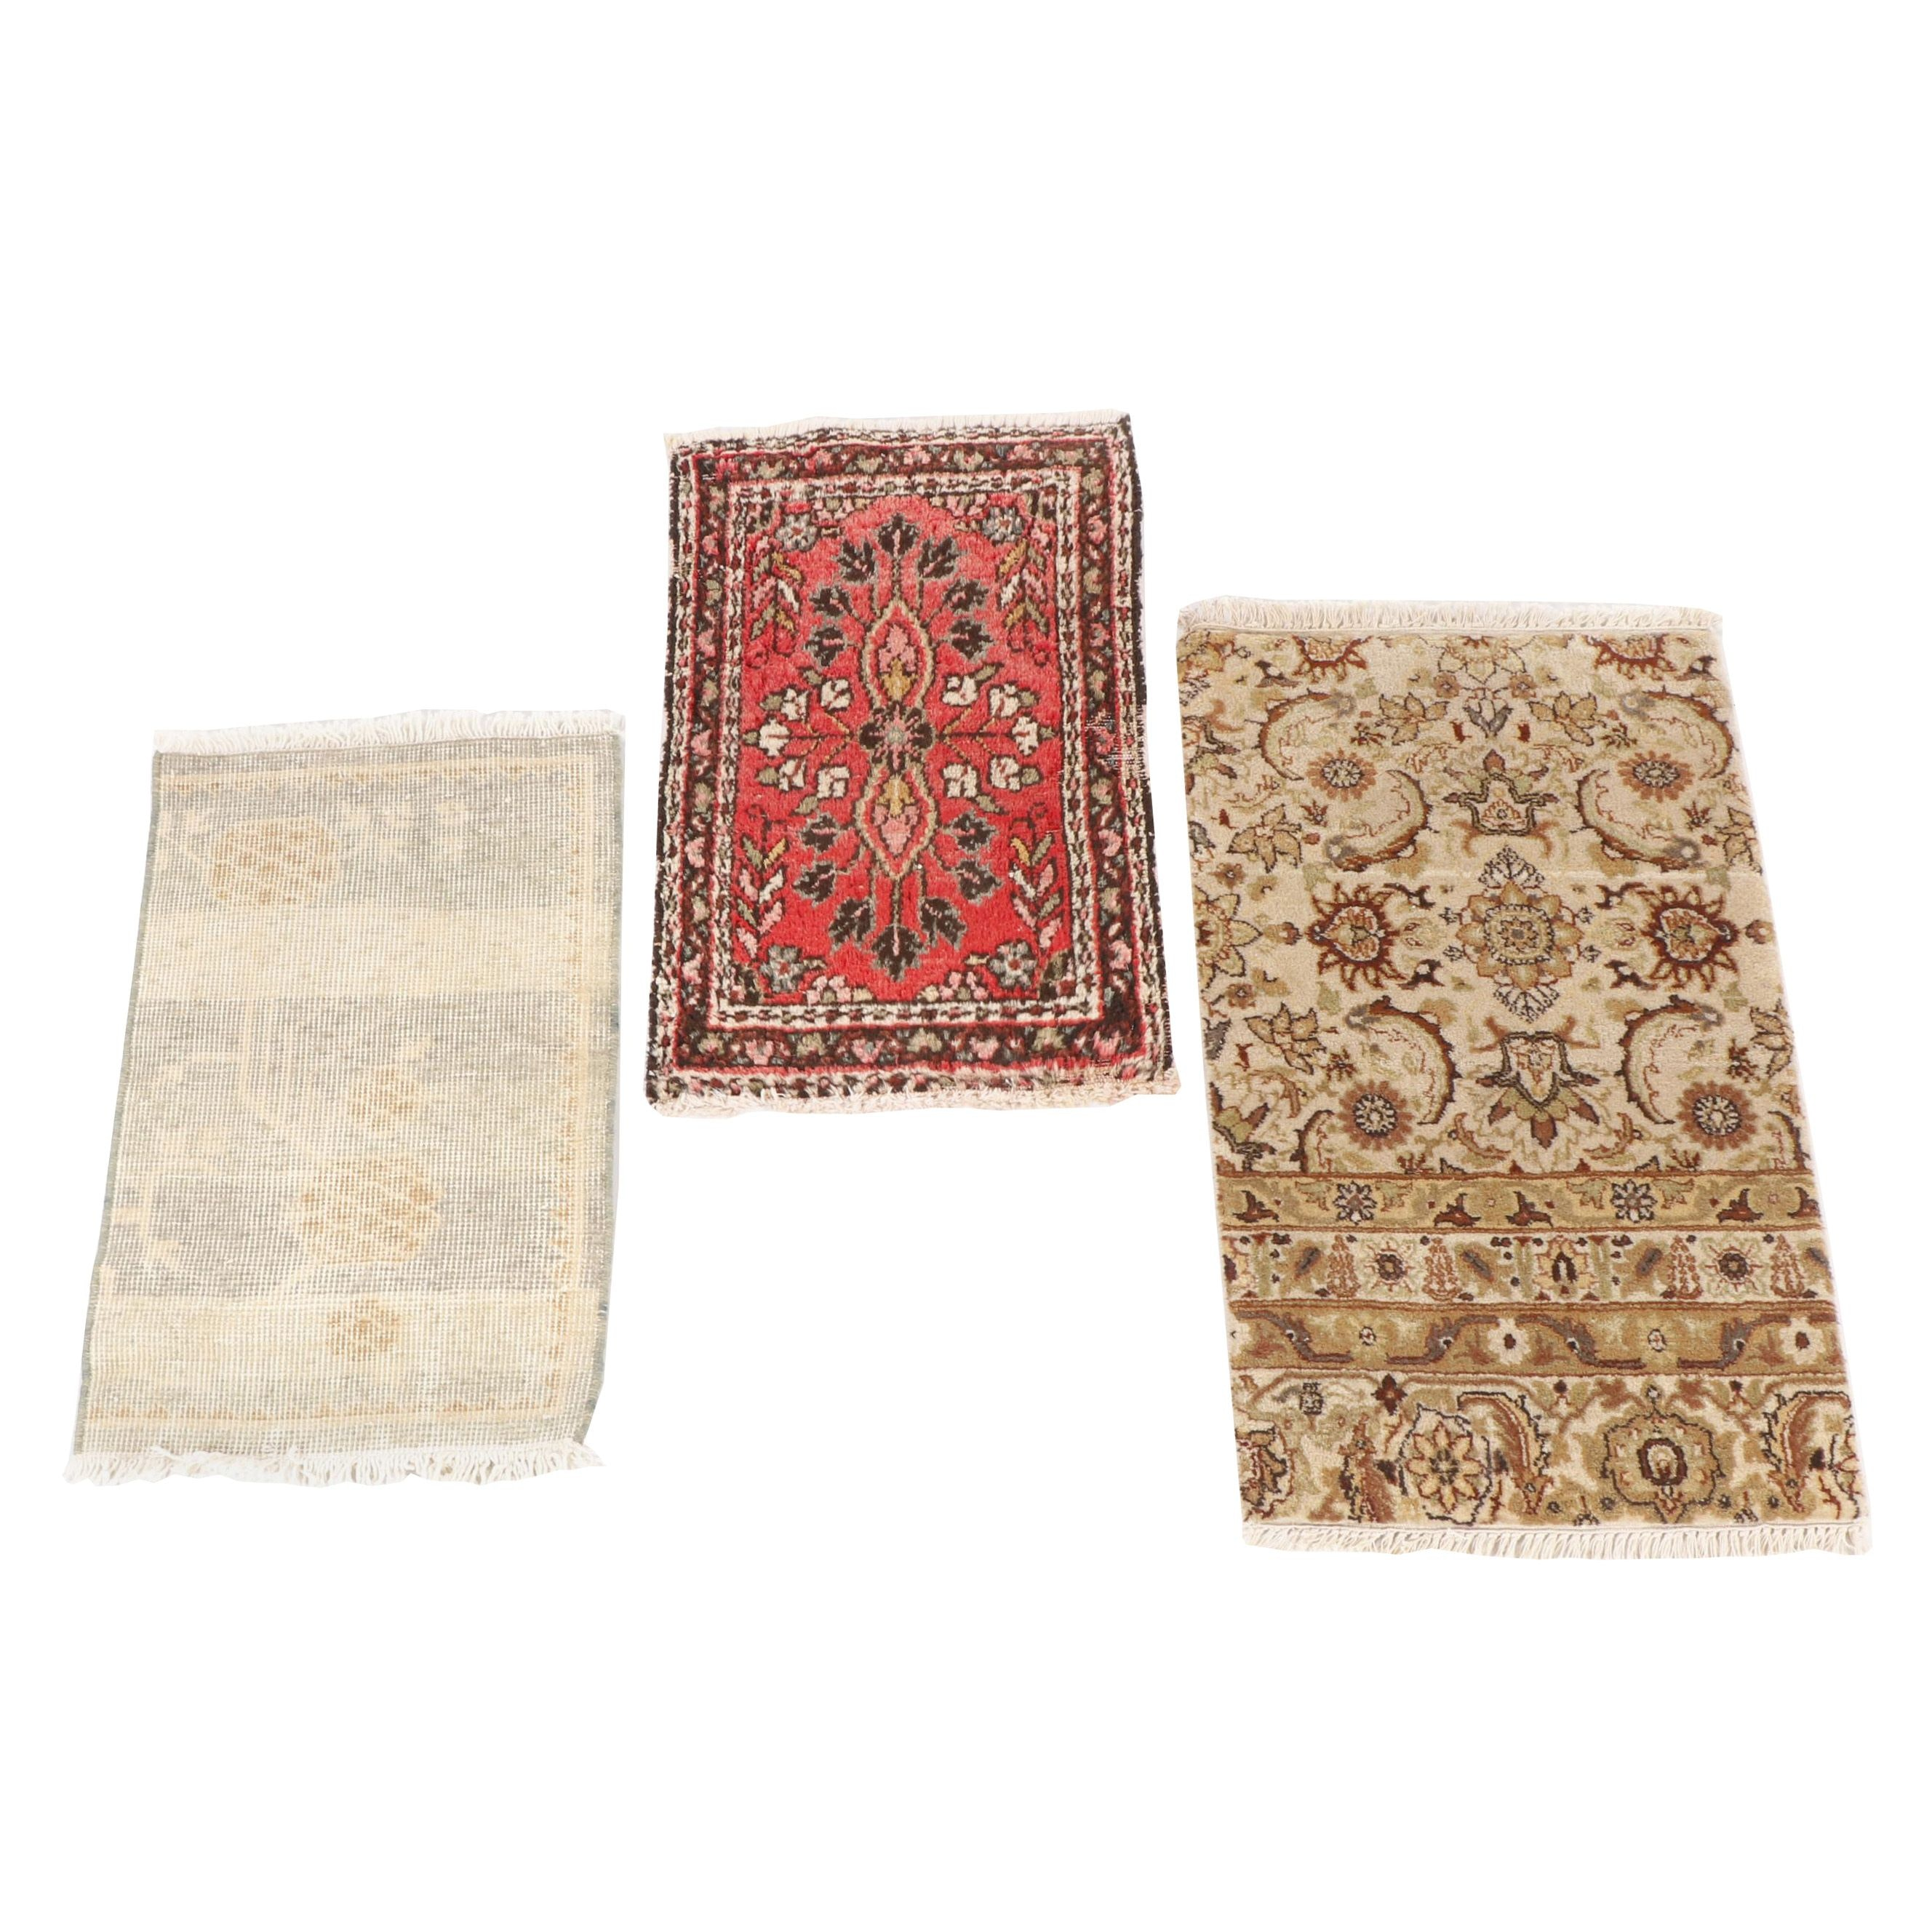 Hand-Knotted Indo-Kashan, Pakistani Peshawar and Persian Hamadan Wool Rugs